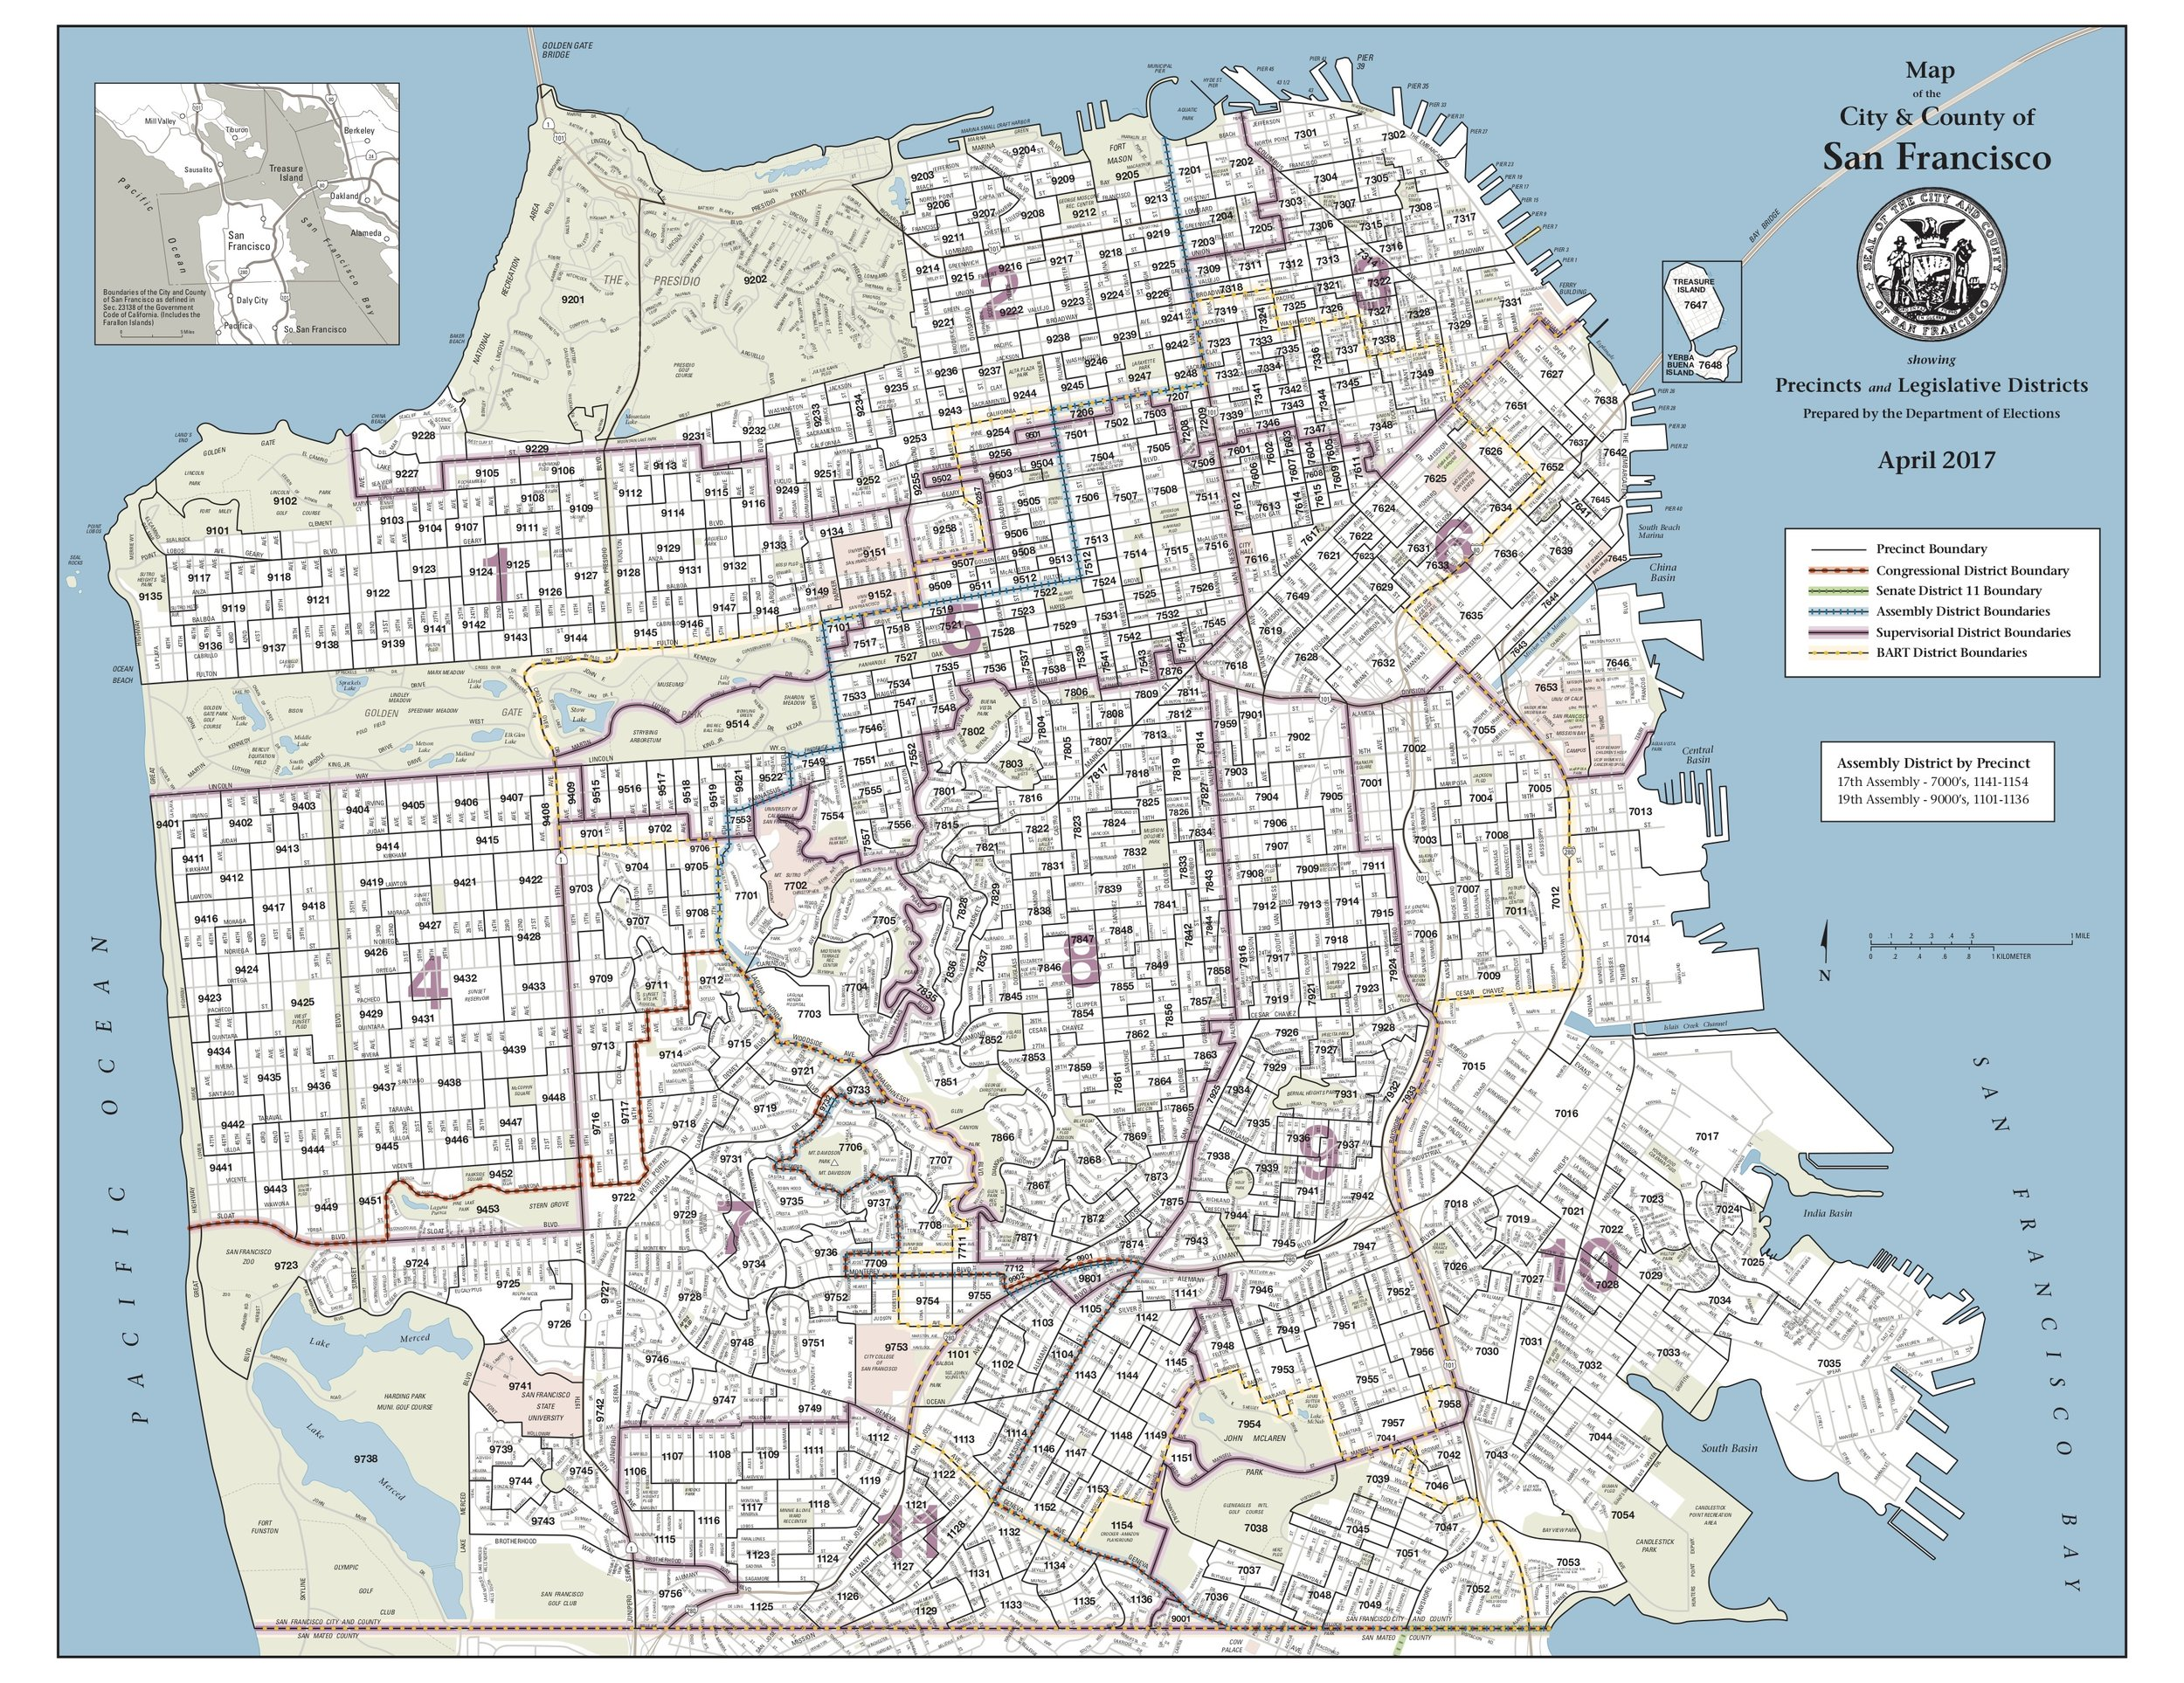 CitywidePctMap_5-2017.jpg